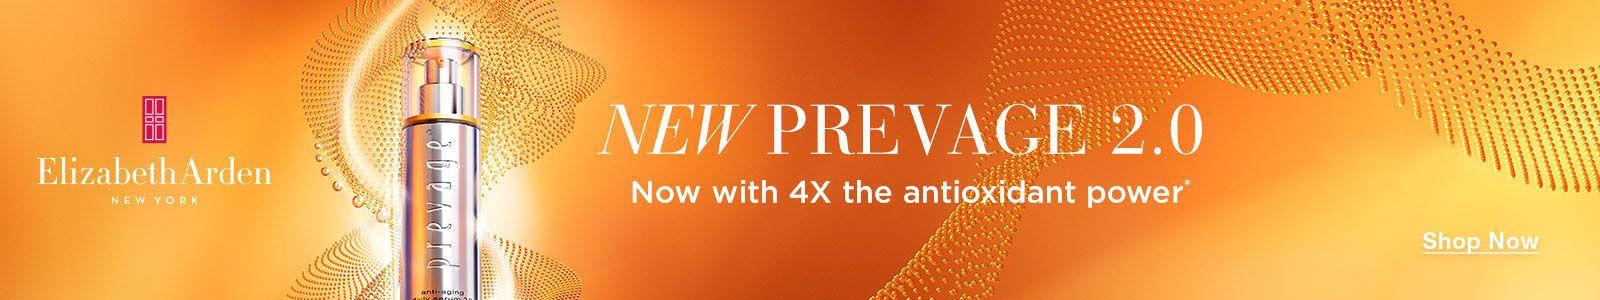 Elizabeth Arden, New York, New Prevage 2.0, Now with 4X the antioxidant power